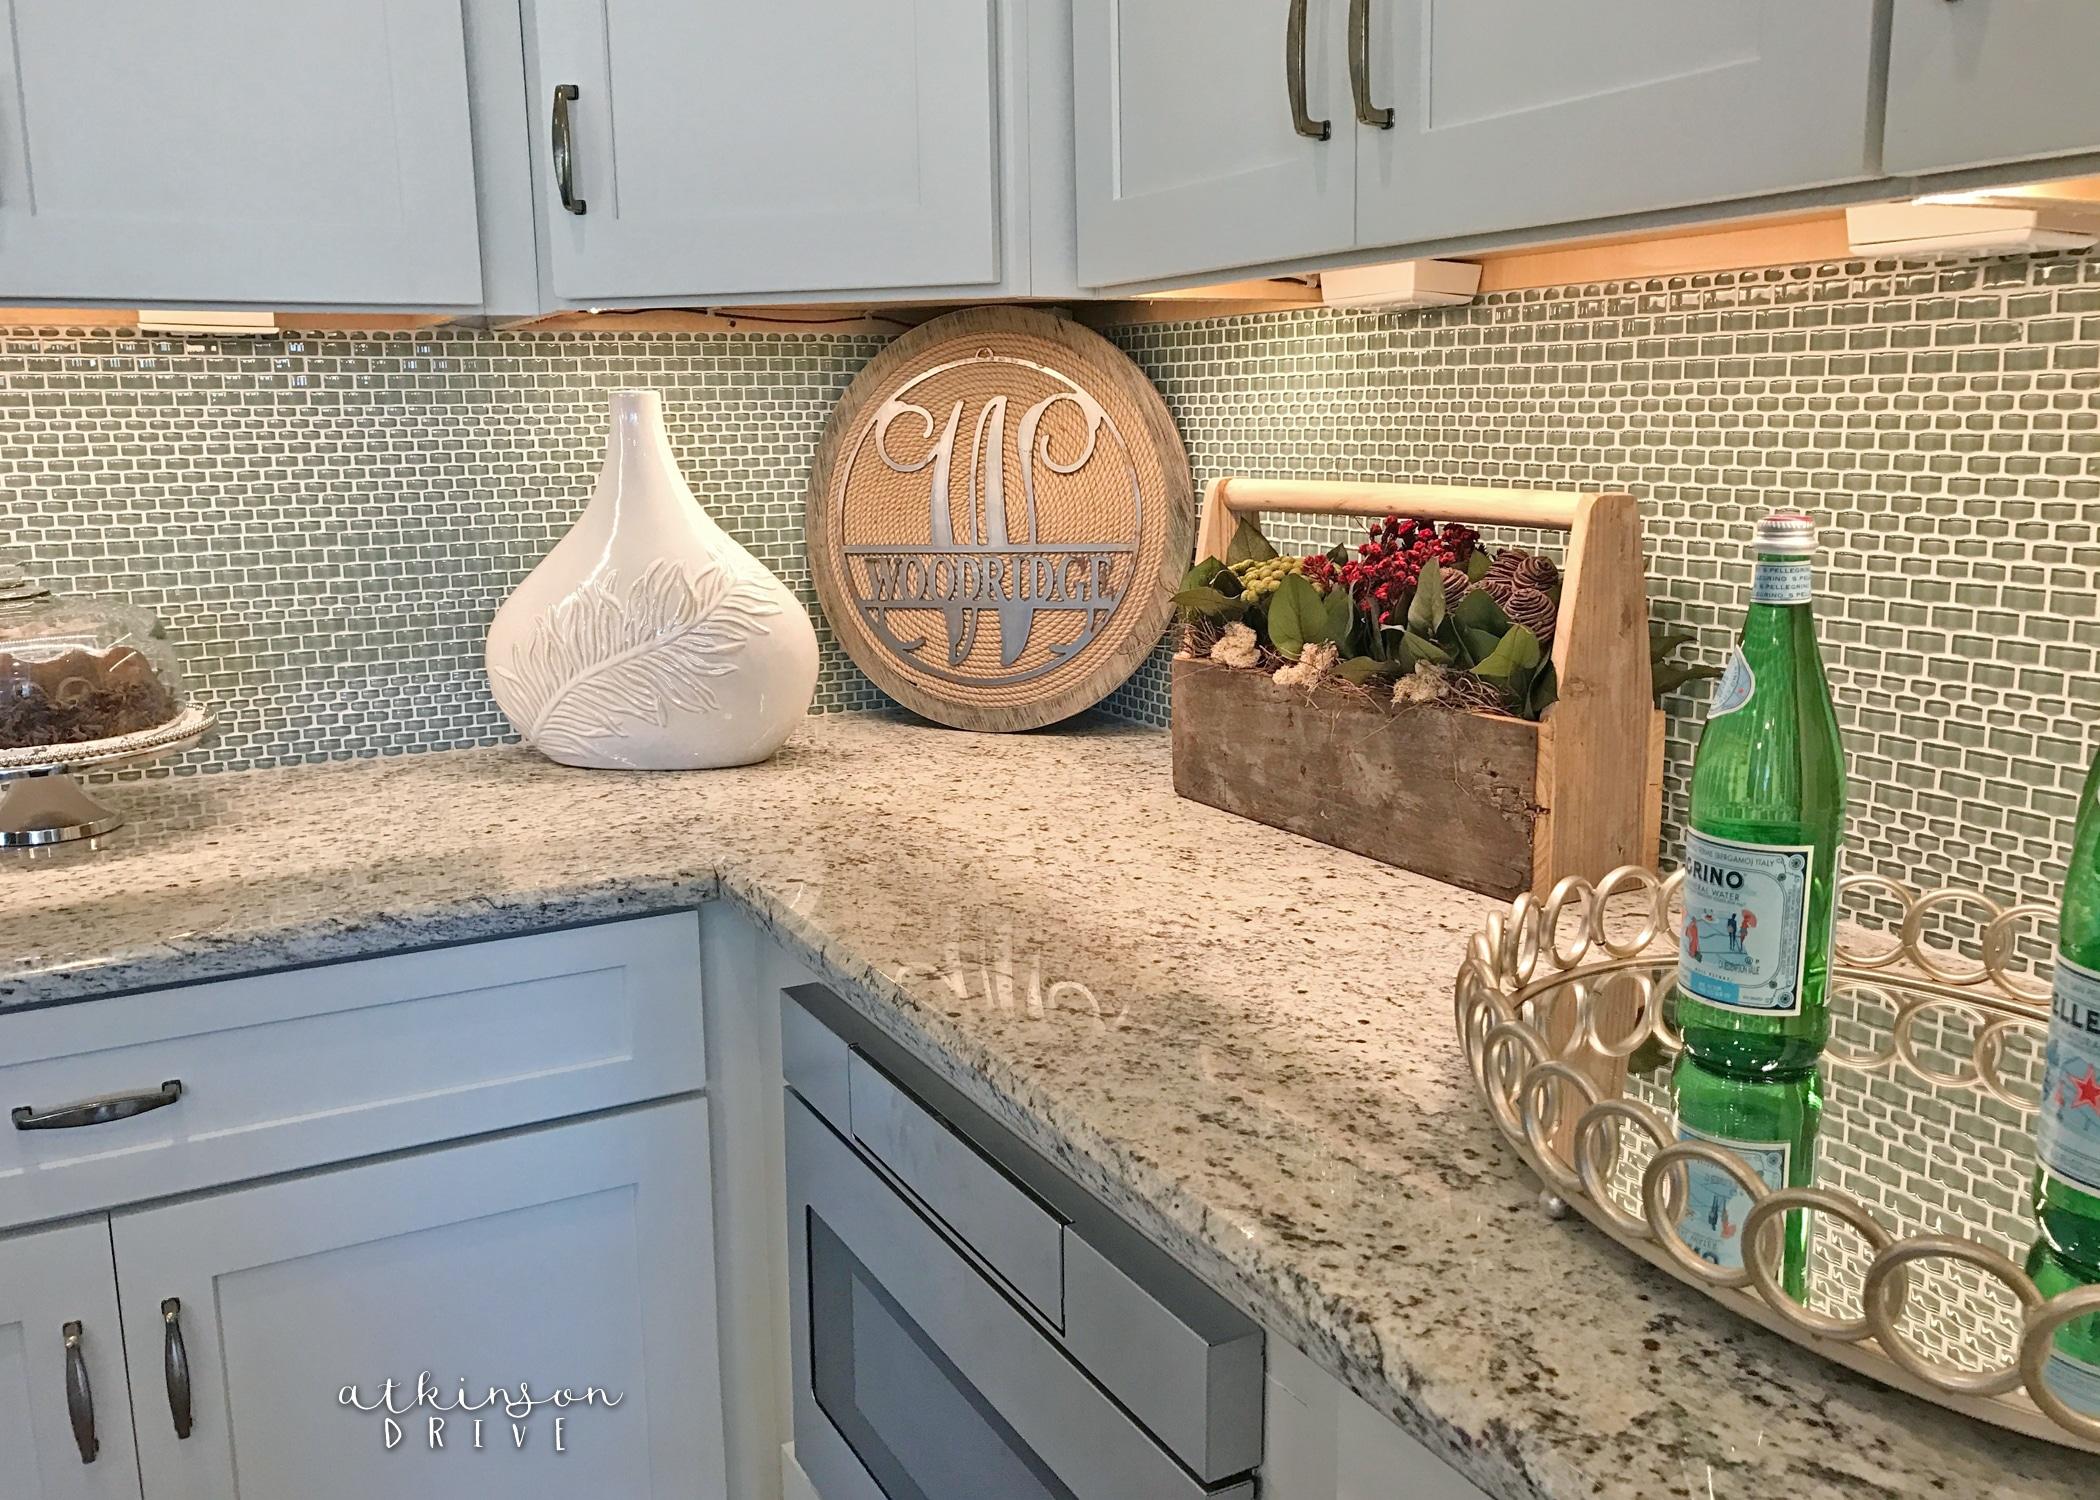 Blue Glass Kitchen Backsplash with White Shaker Style Cabinets /// Woodridge Parade of Homes Tour by Atkinson Drive